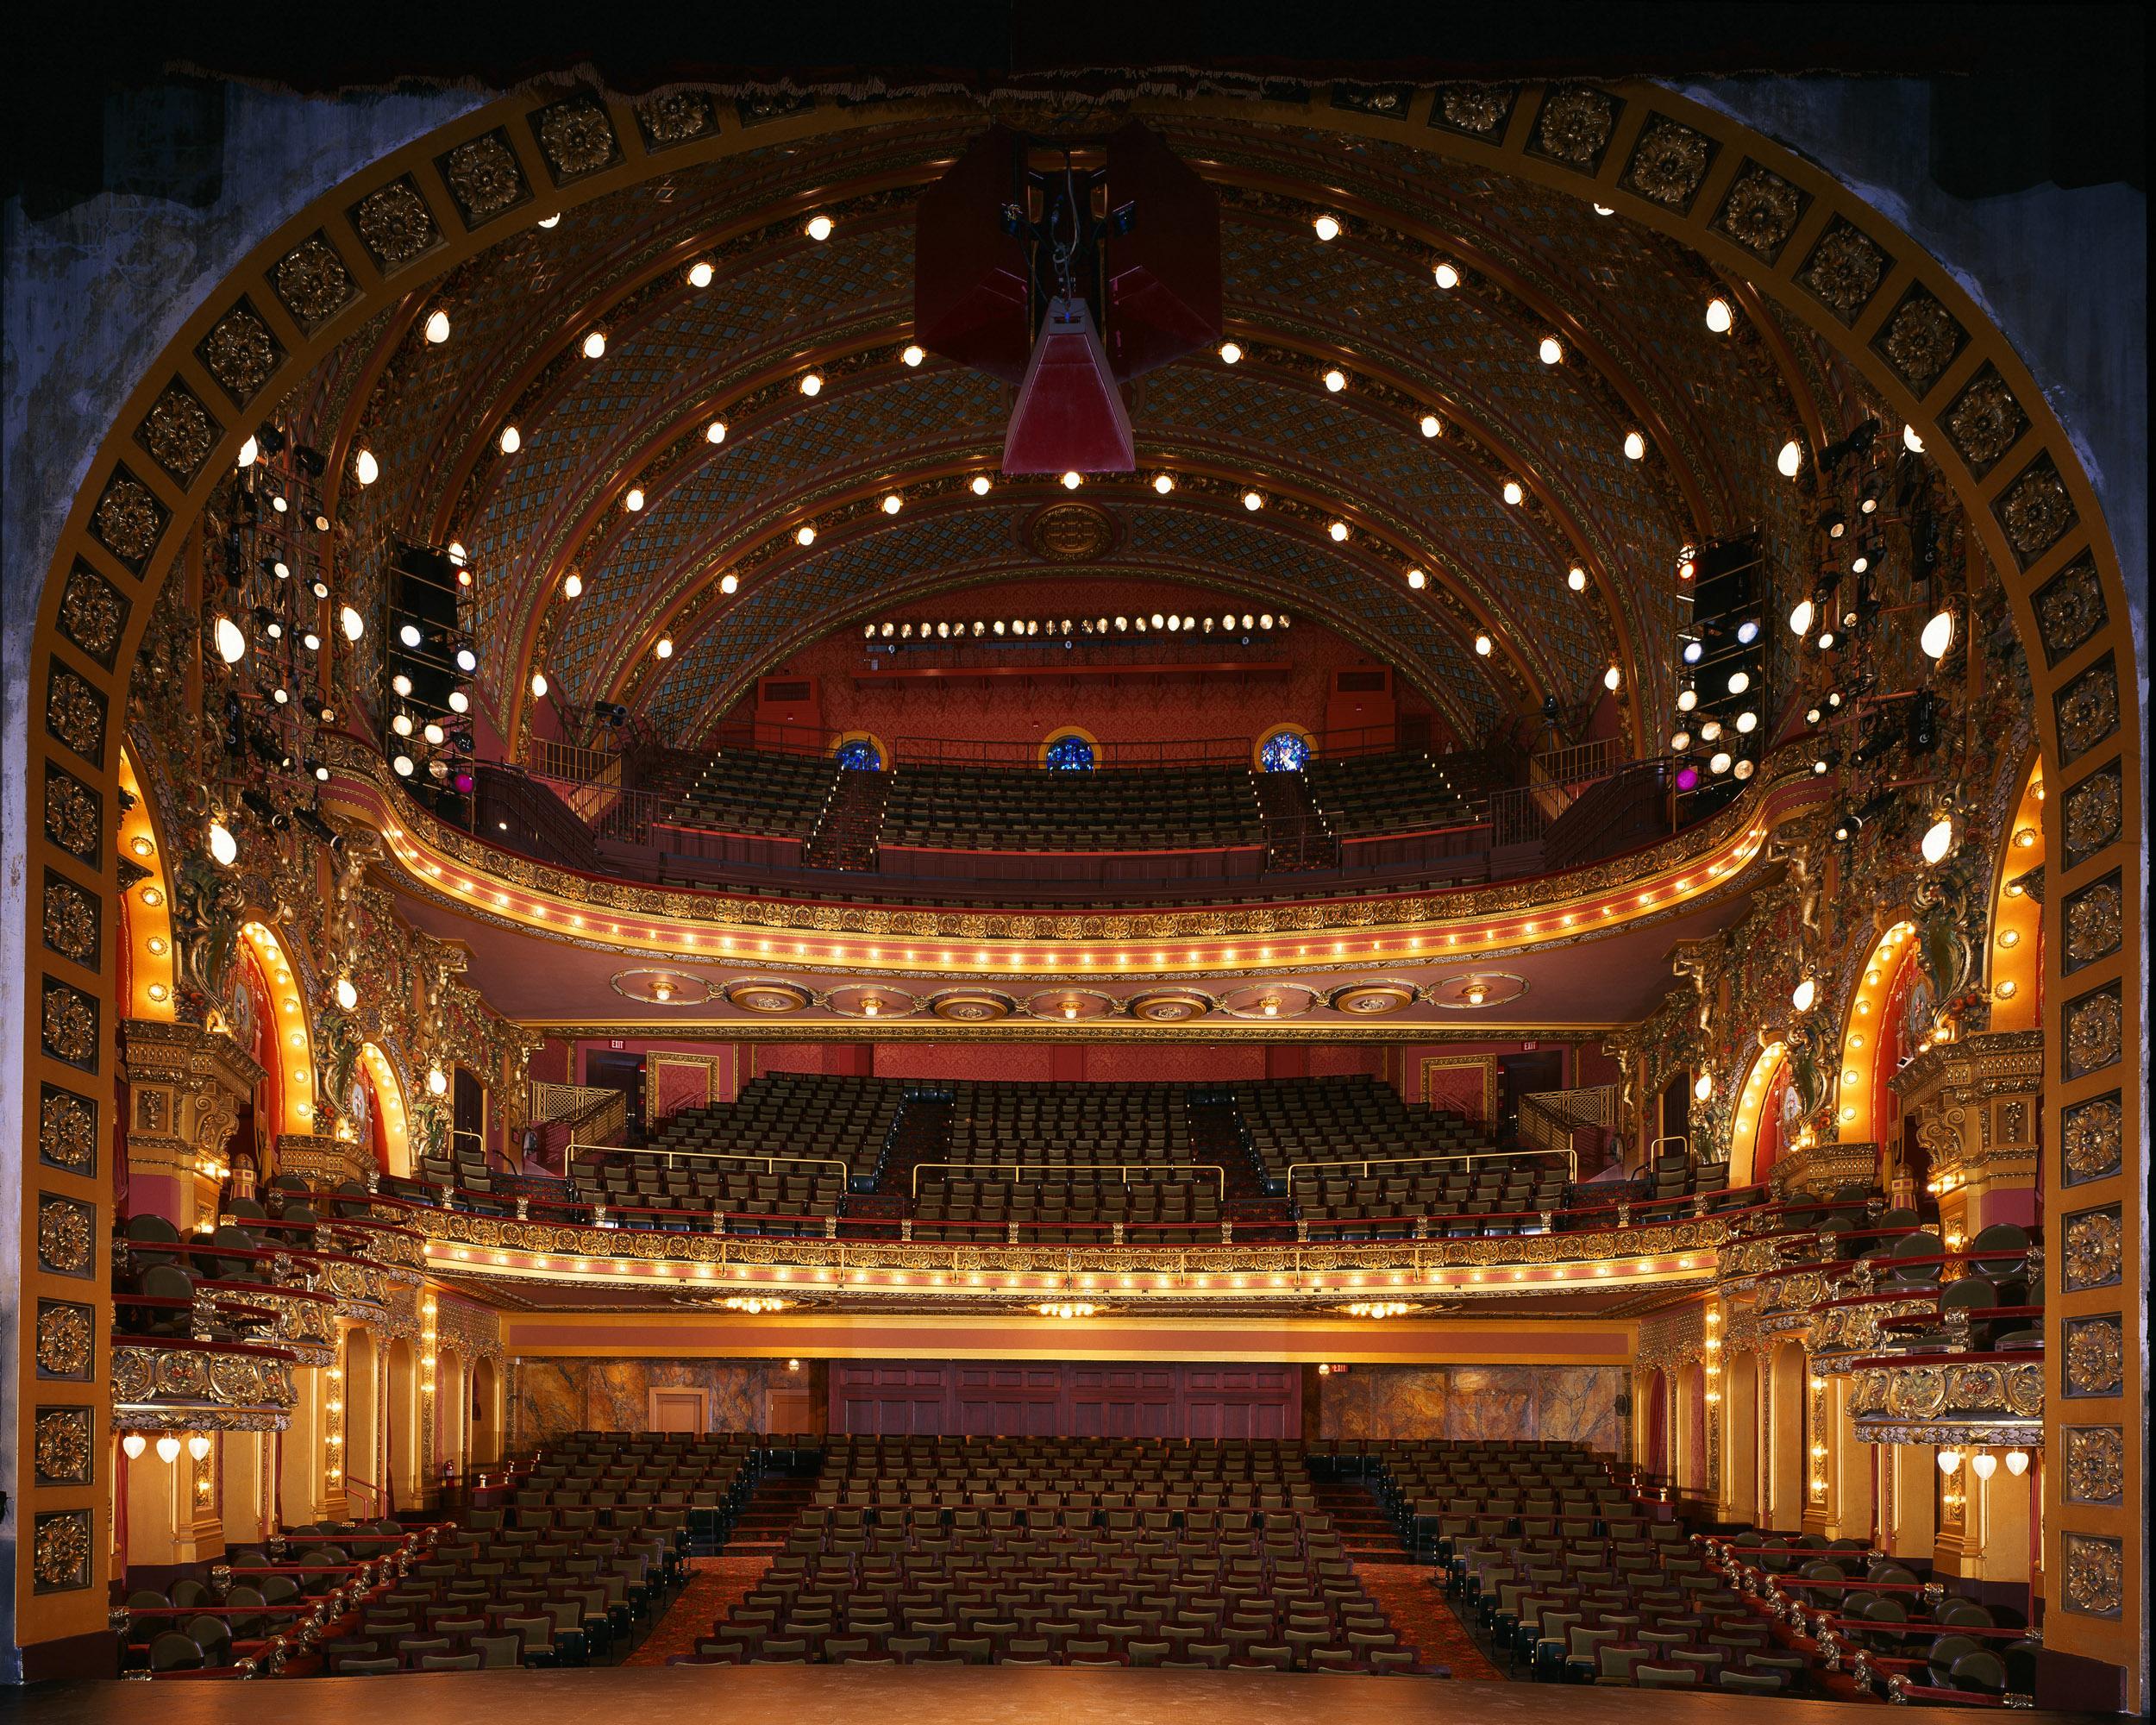 Emerson cutler majestic theatre tickets also boston schedule seating rh goldstar